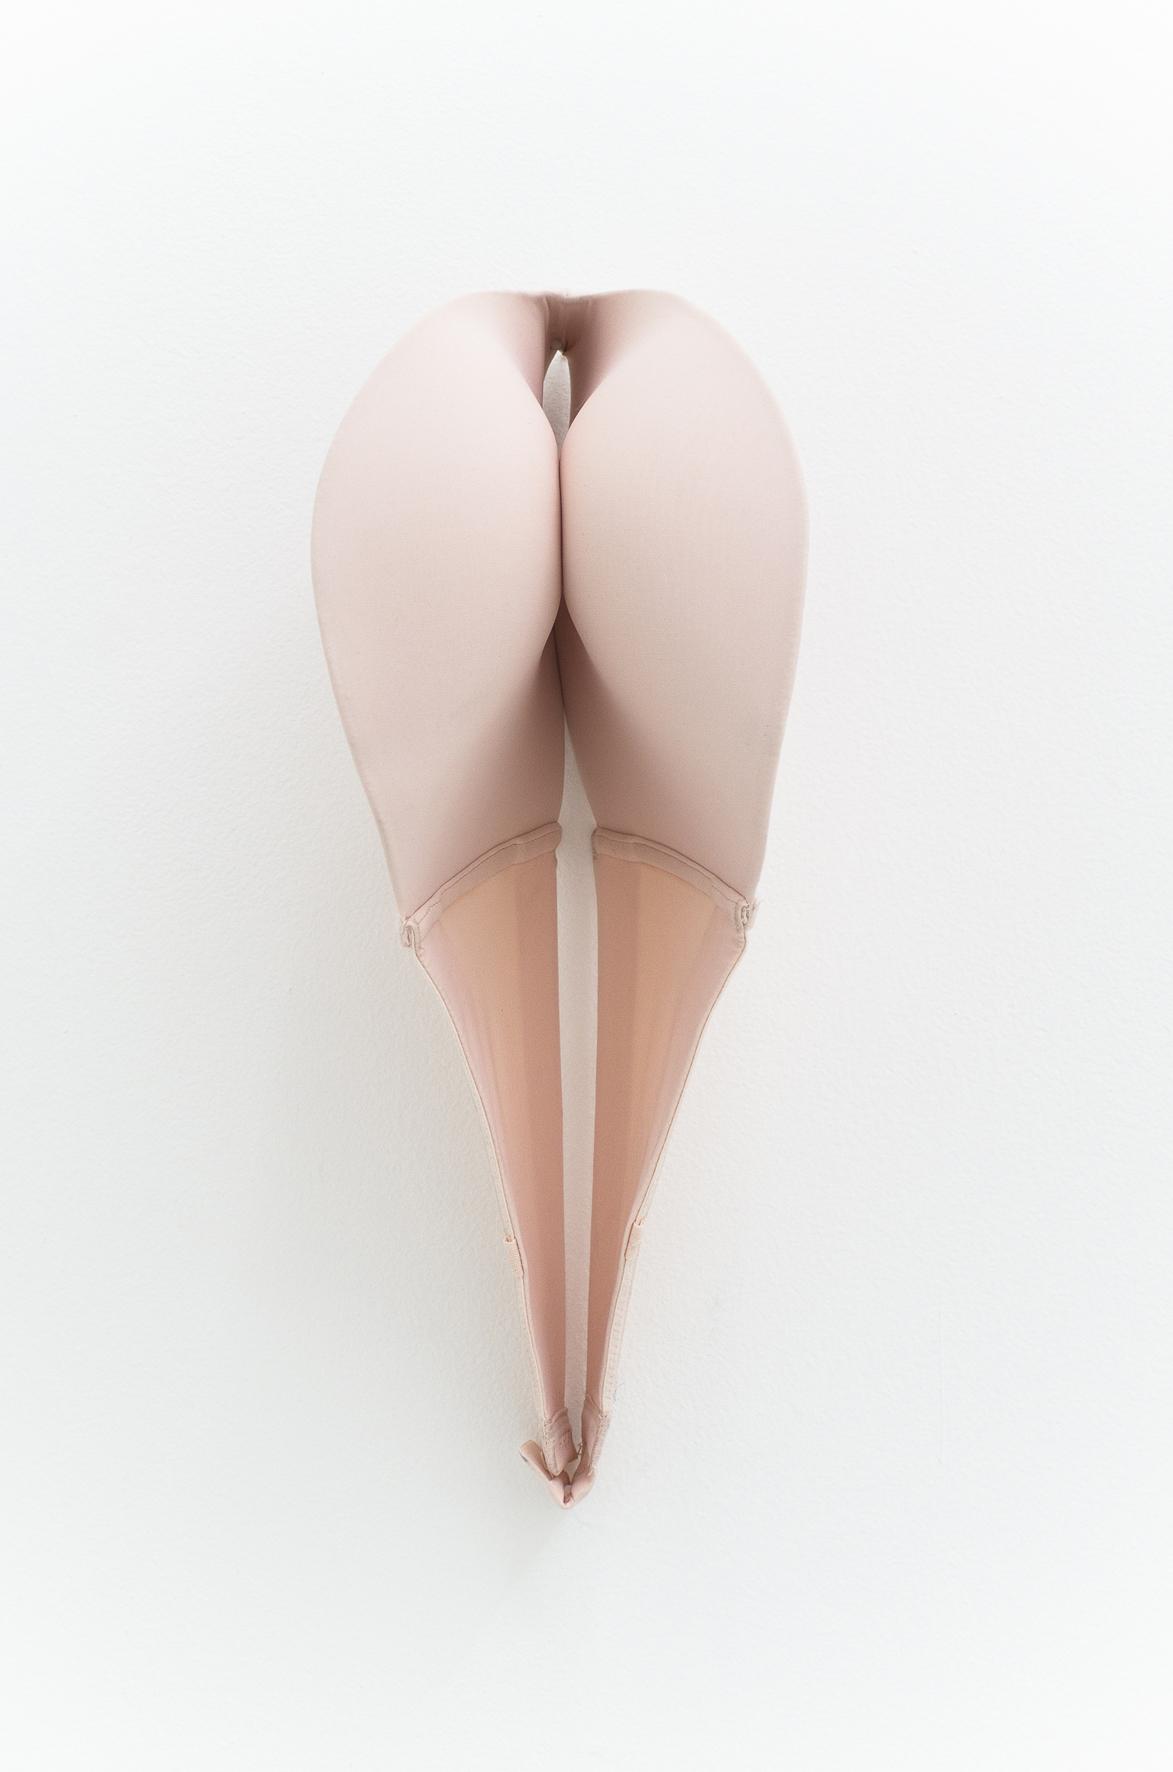 Mrs. Natural, 2010, Bra, 40 x 15 x 15cm